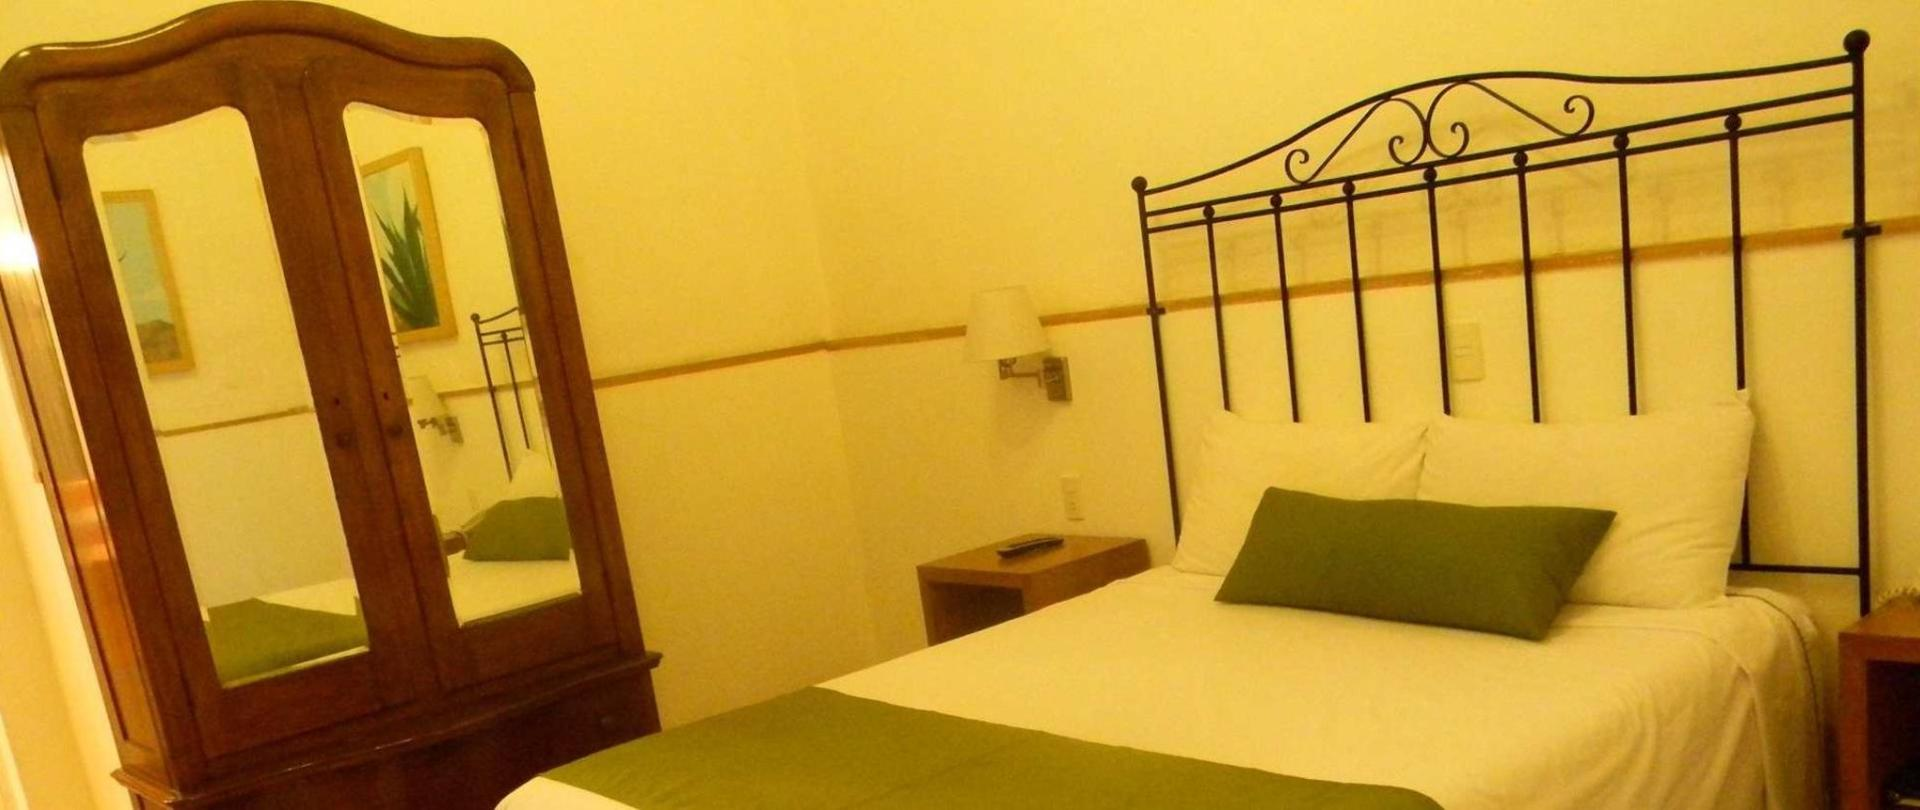 Rooms - Hotel Quinta Lucca -Querétaro.jpg